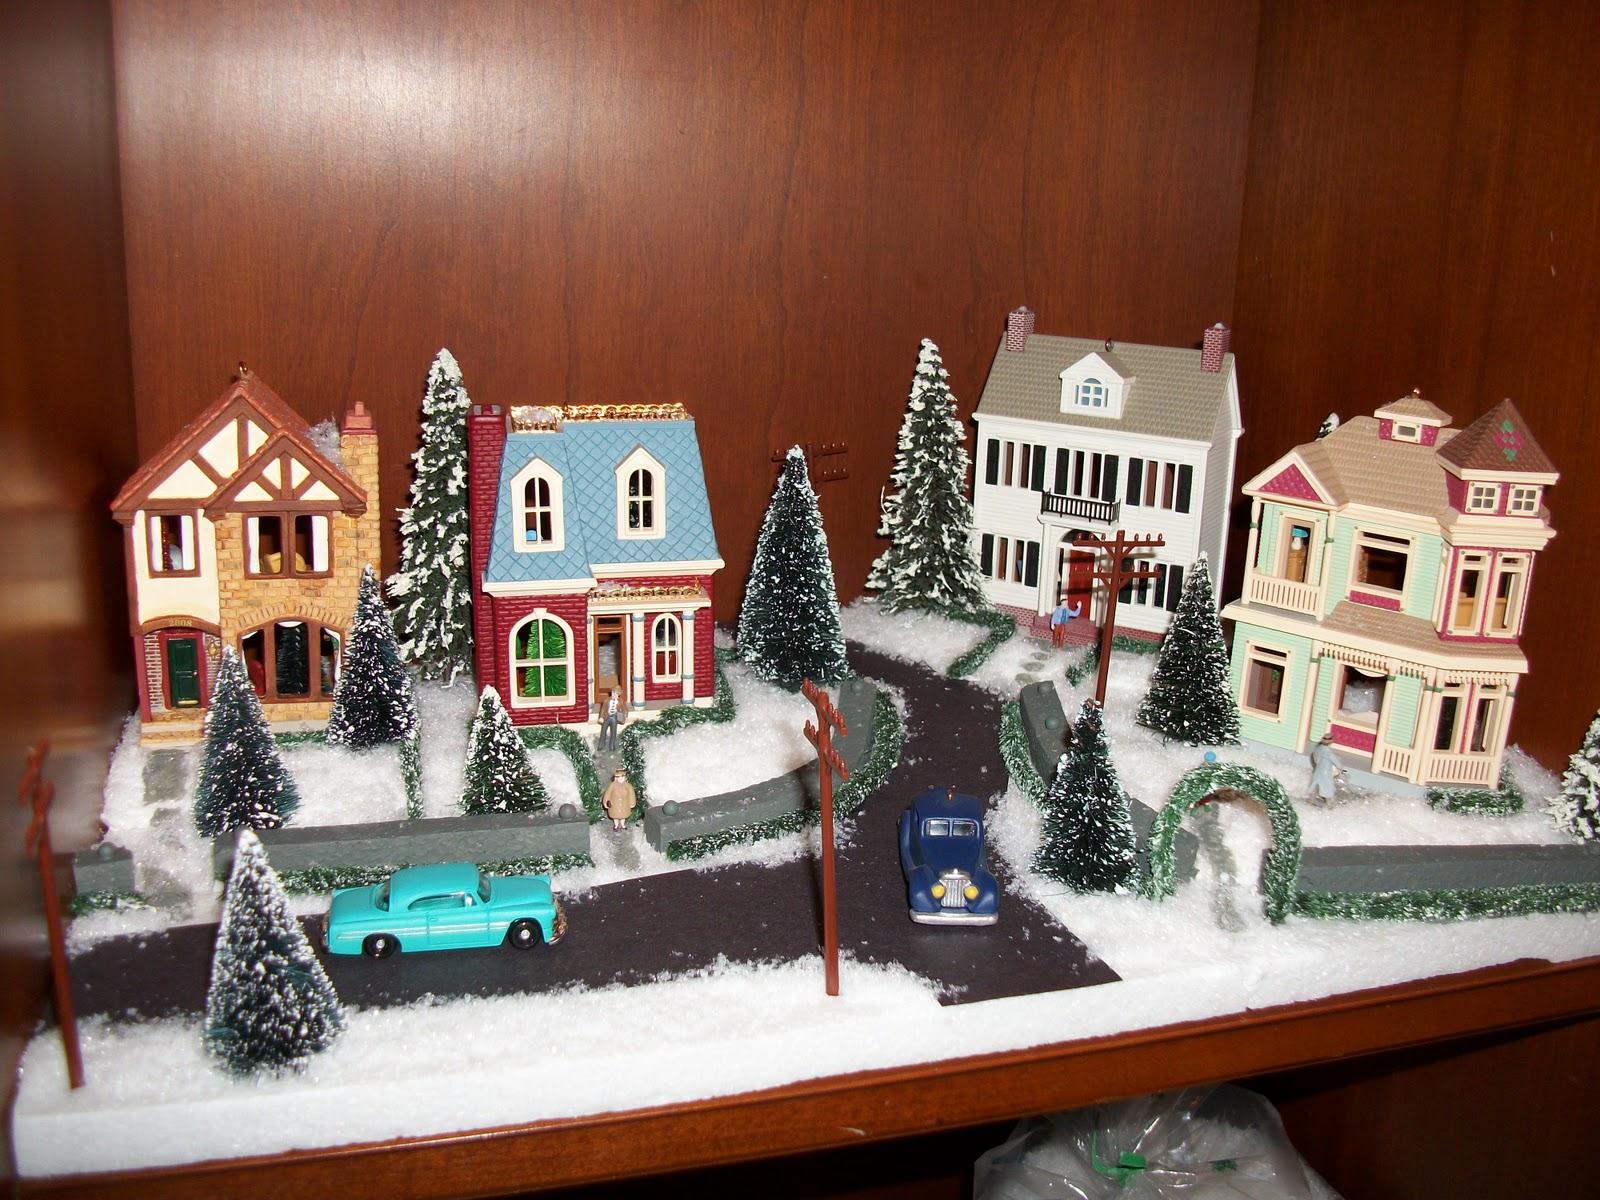 The Average Designer Displaying Nostalgic Houses And Shops By Hallmark